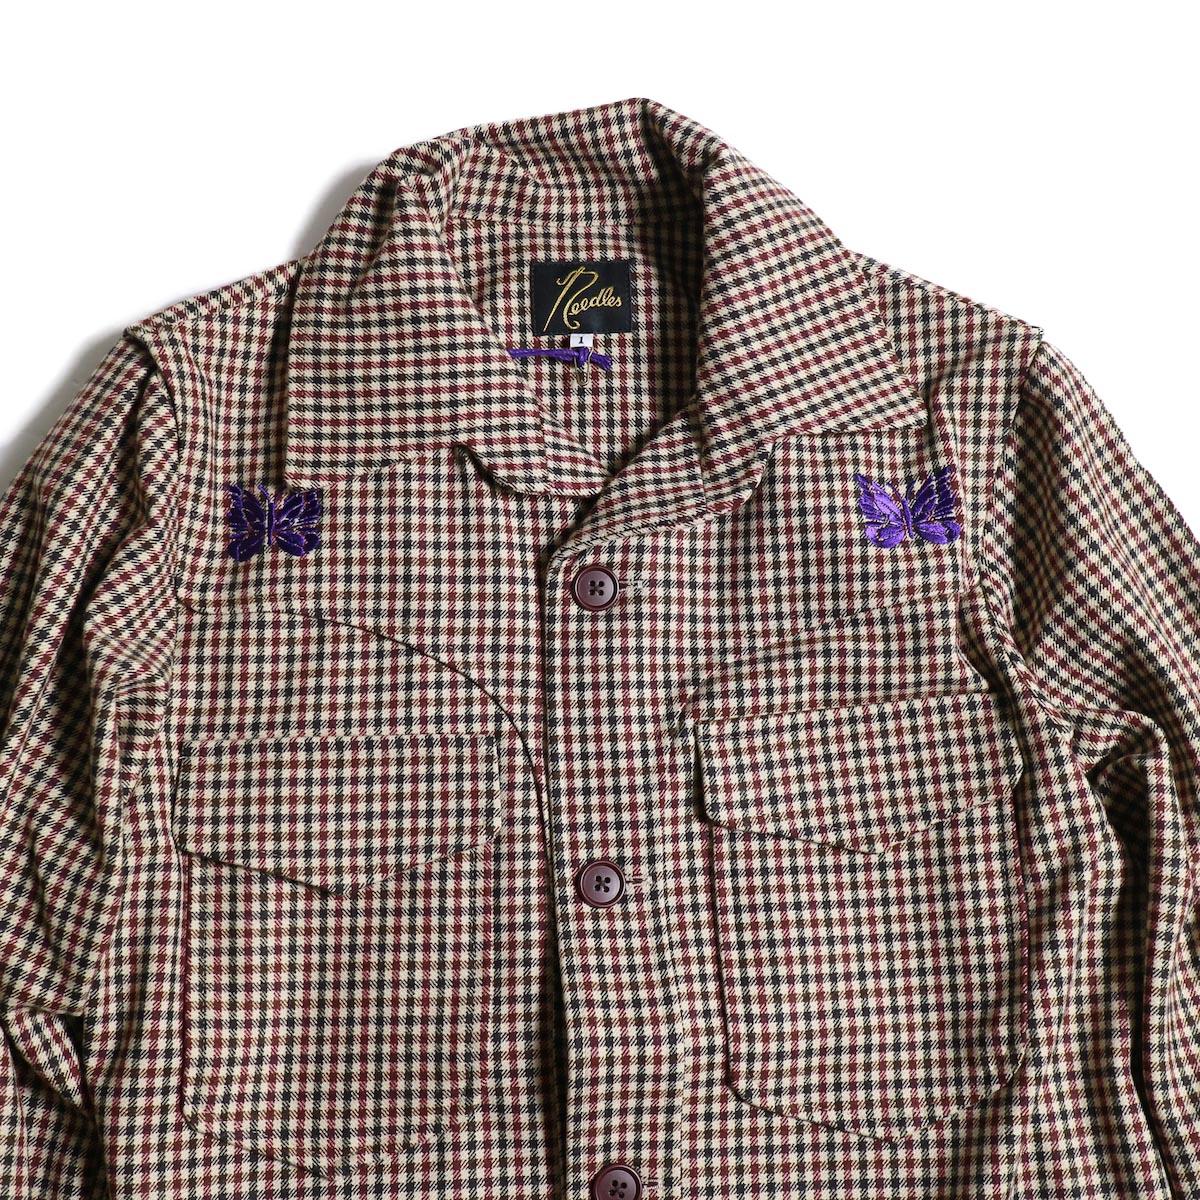 Needles / Cowboy Leisure Jacket -Gunclub Plaid (Bordeaux)パピヨン、ポケット